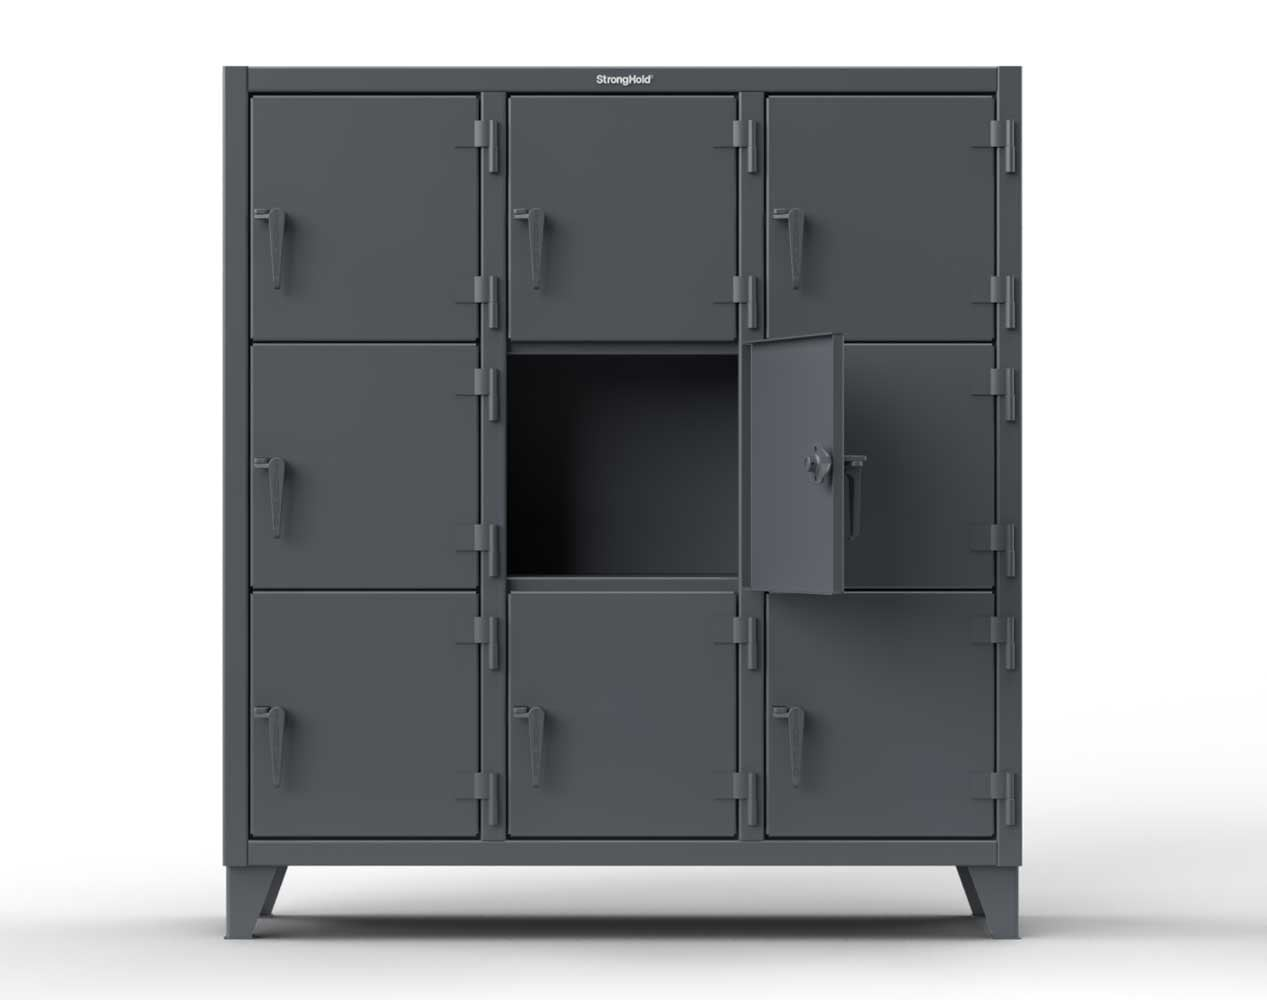 Extra Heavy Duty 12 GA Triple-Tier Locker with 12 Compartments, 82 in. W x 18in. D x 68 in. H